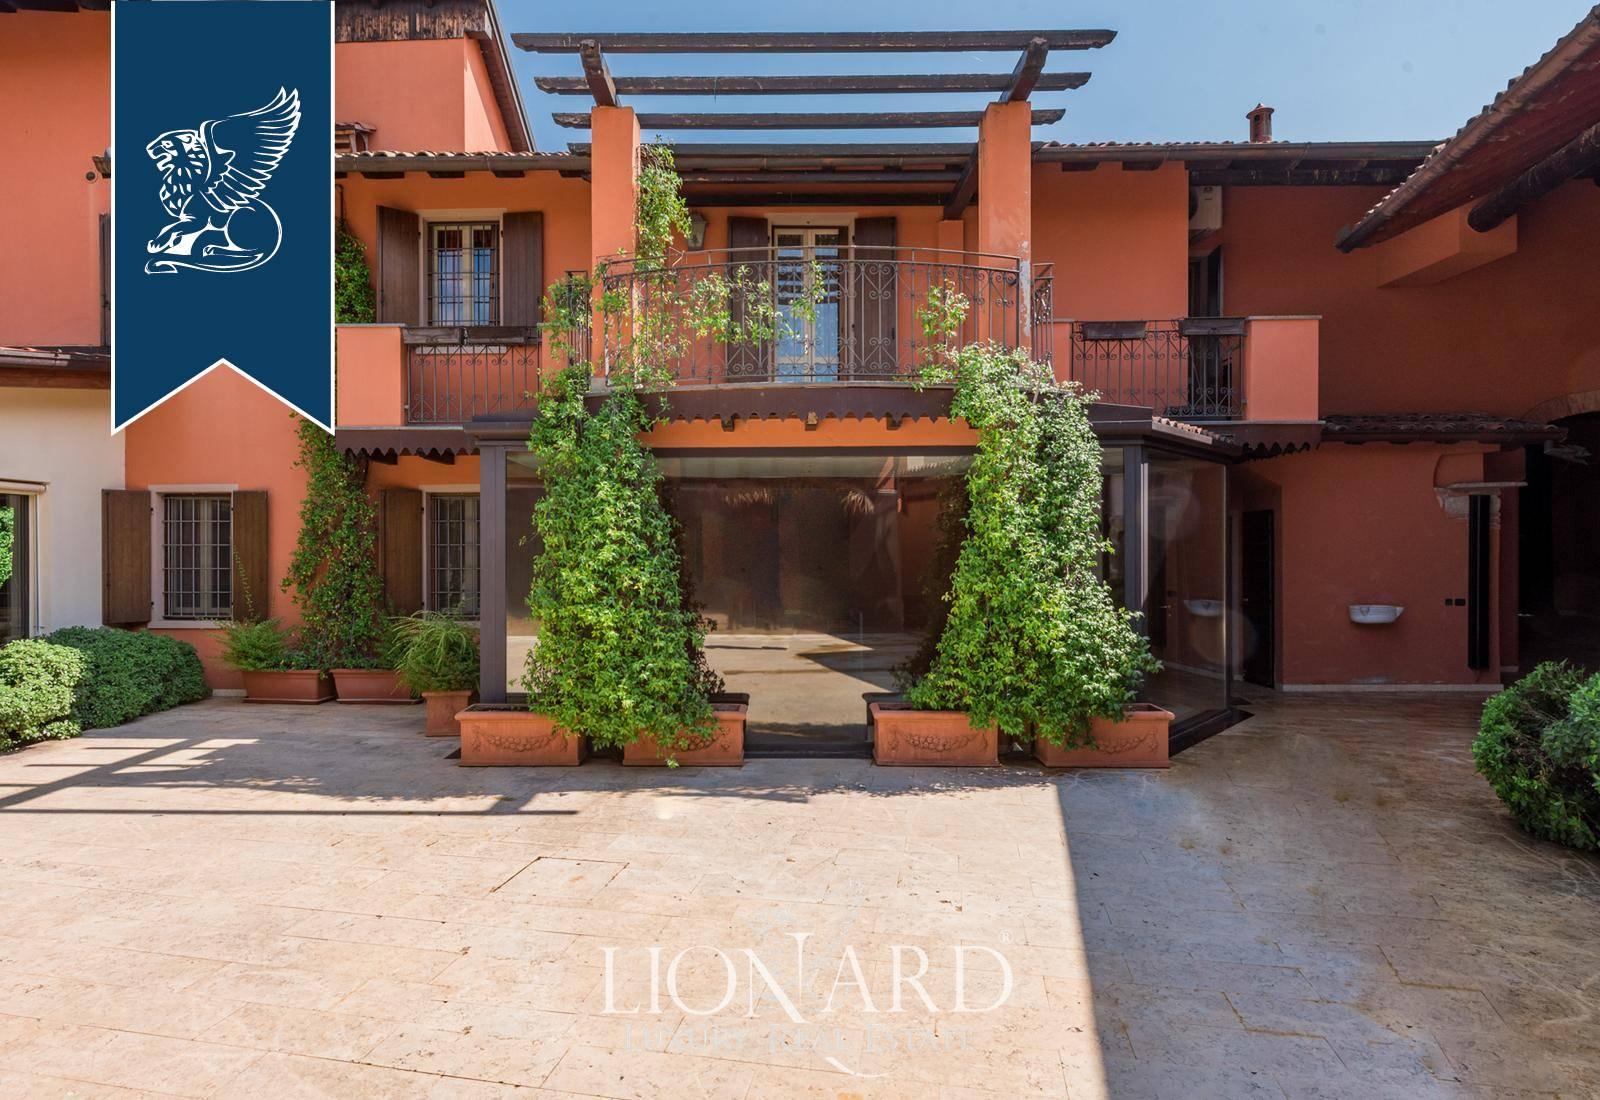 Villa in Vendita a Fara Gera D'Adda: 0 locali, 1350 mq - Foto 4